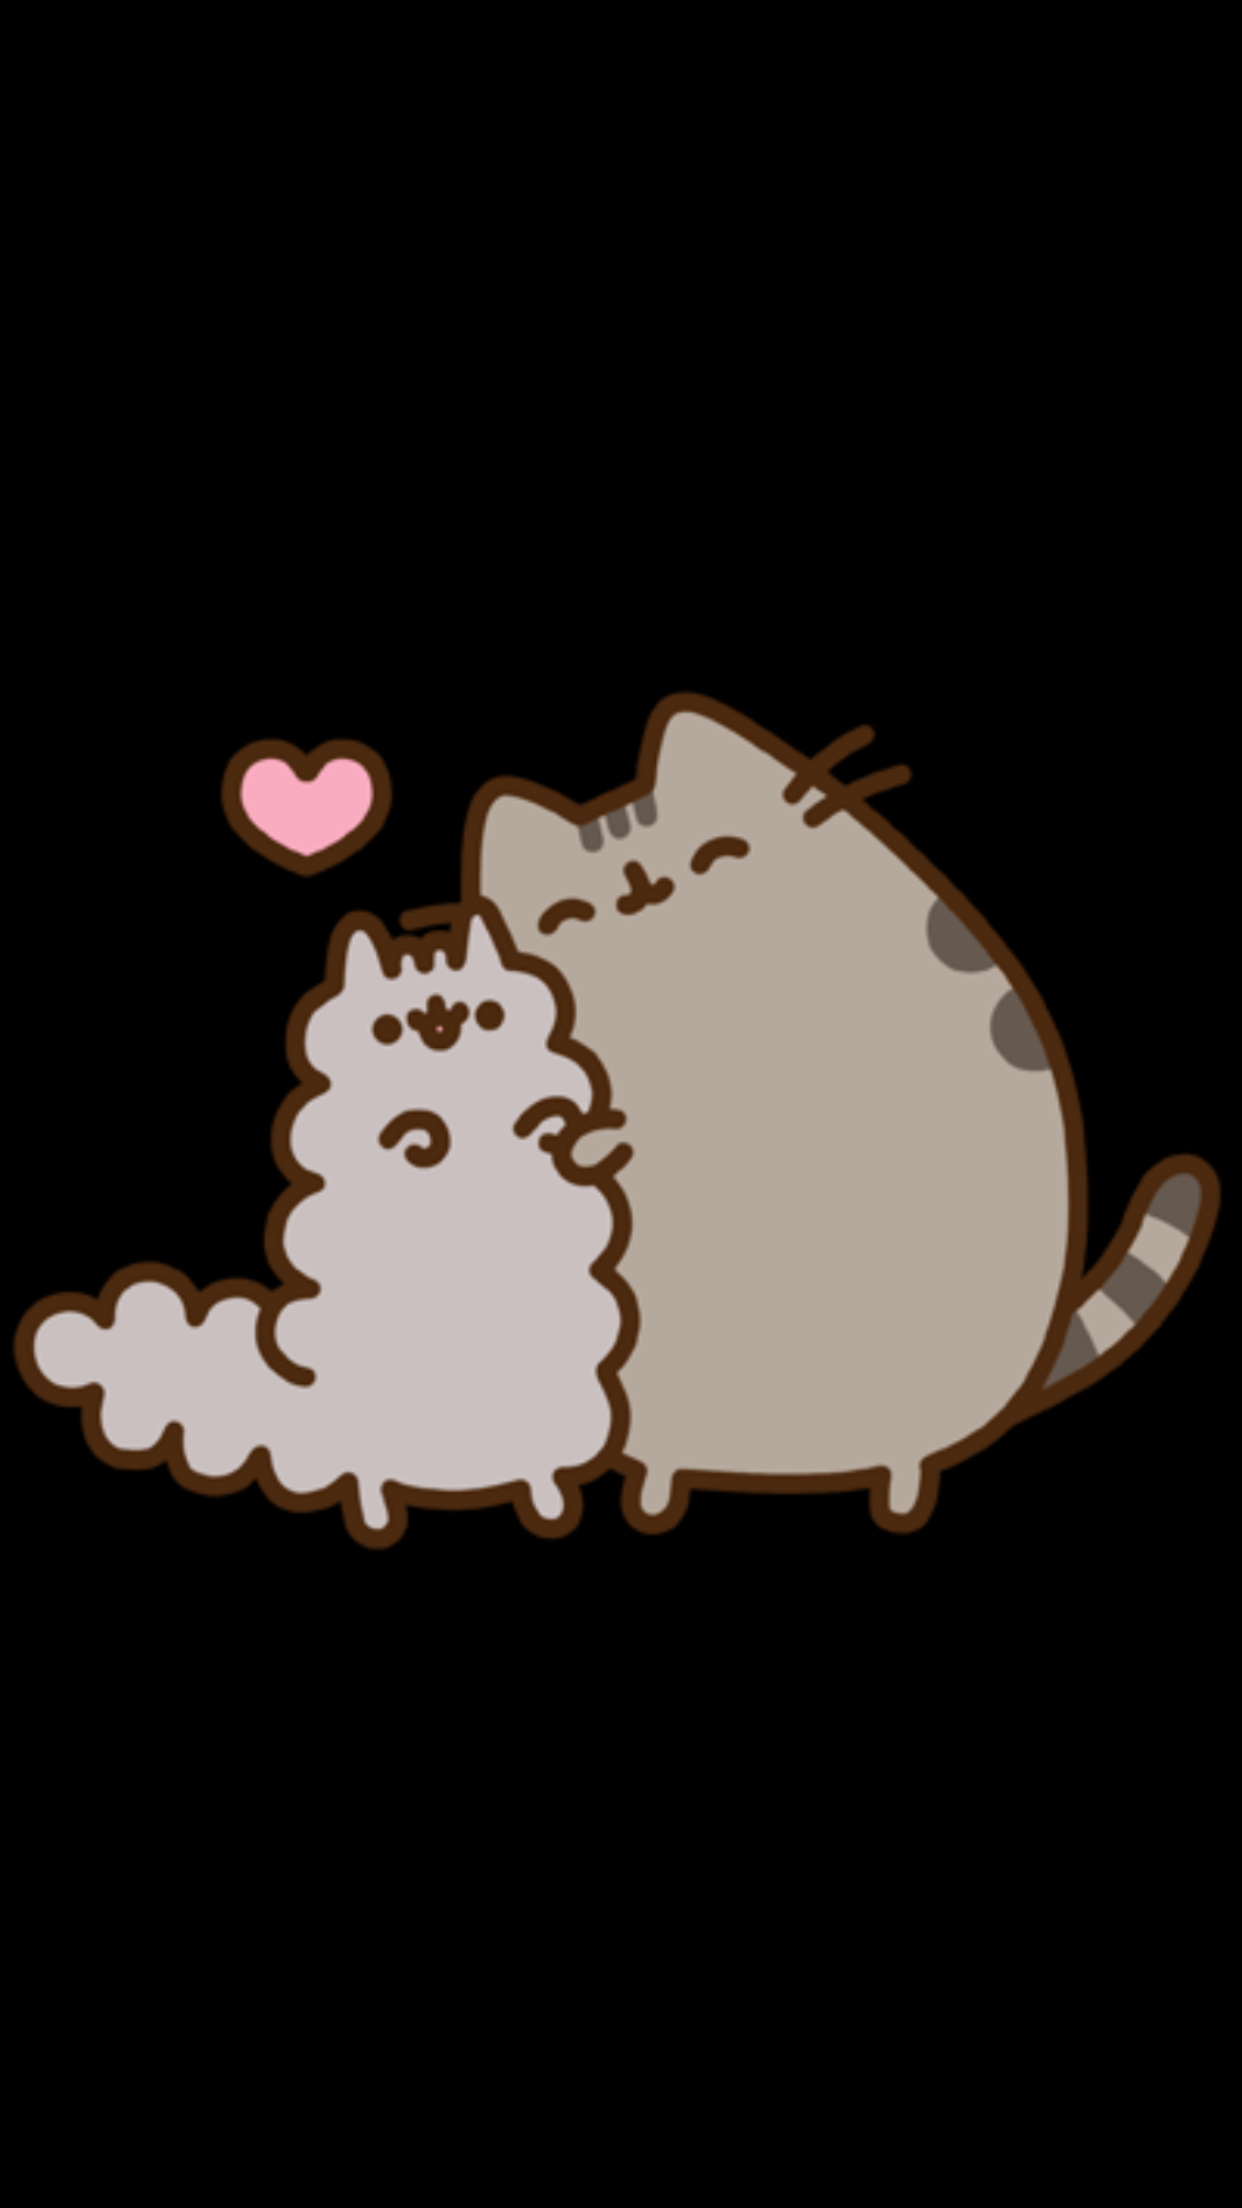 Happy Valentine S Day Pusheen Pusheen Cat Pusheen Stickers Pusheen